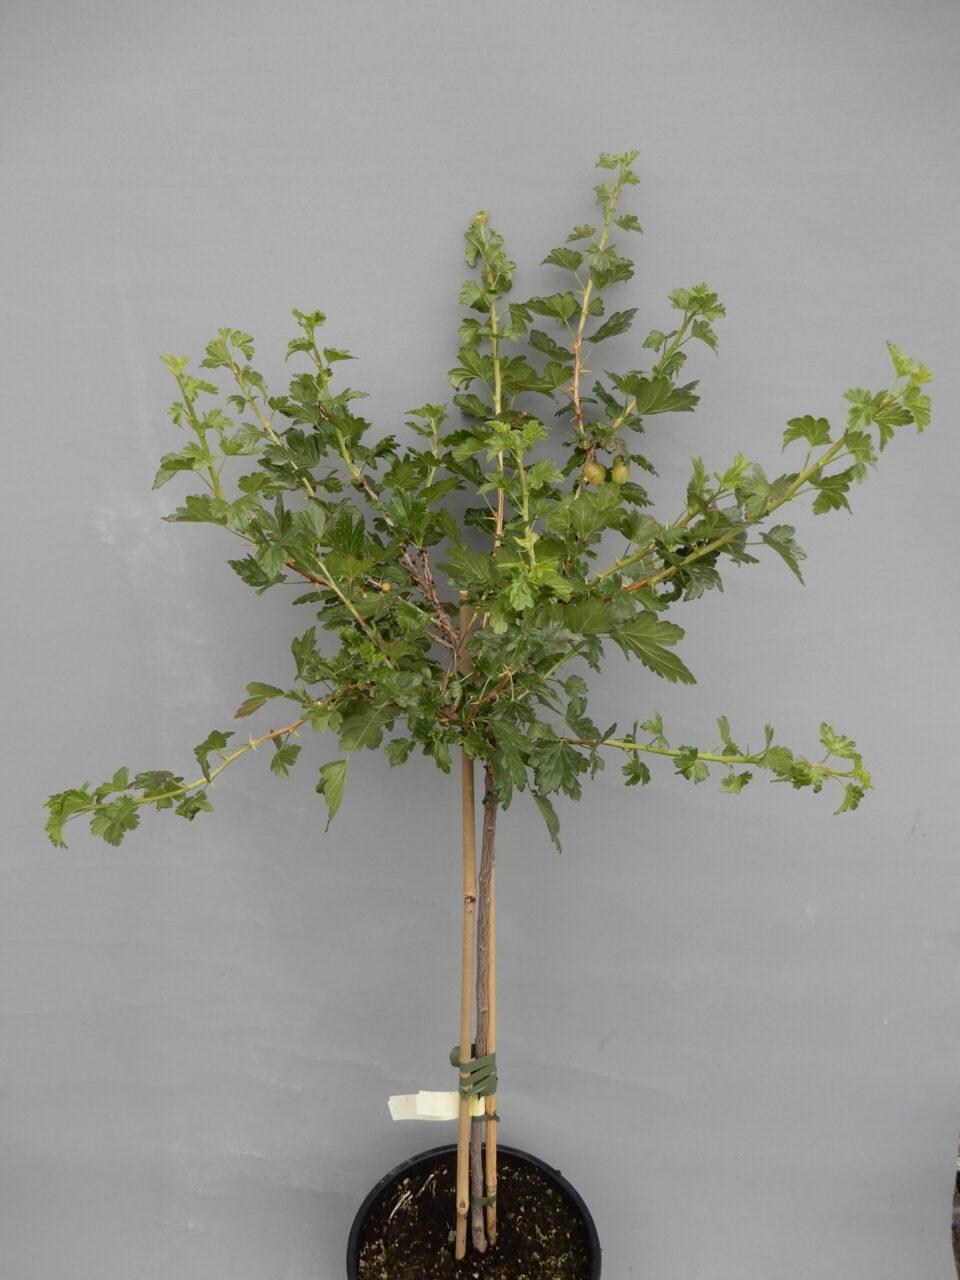 Ogrozd žuti stablo 80kn